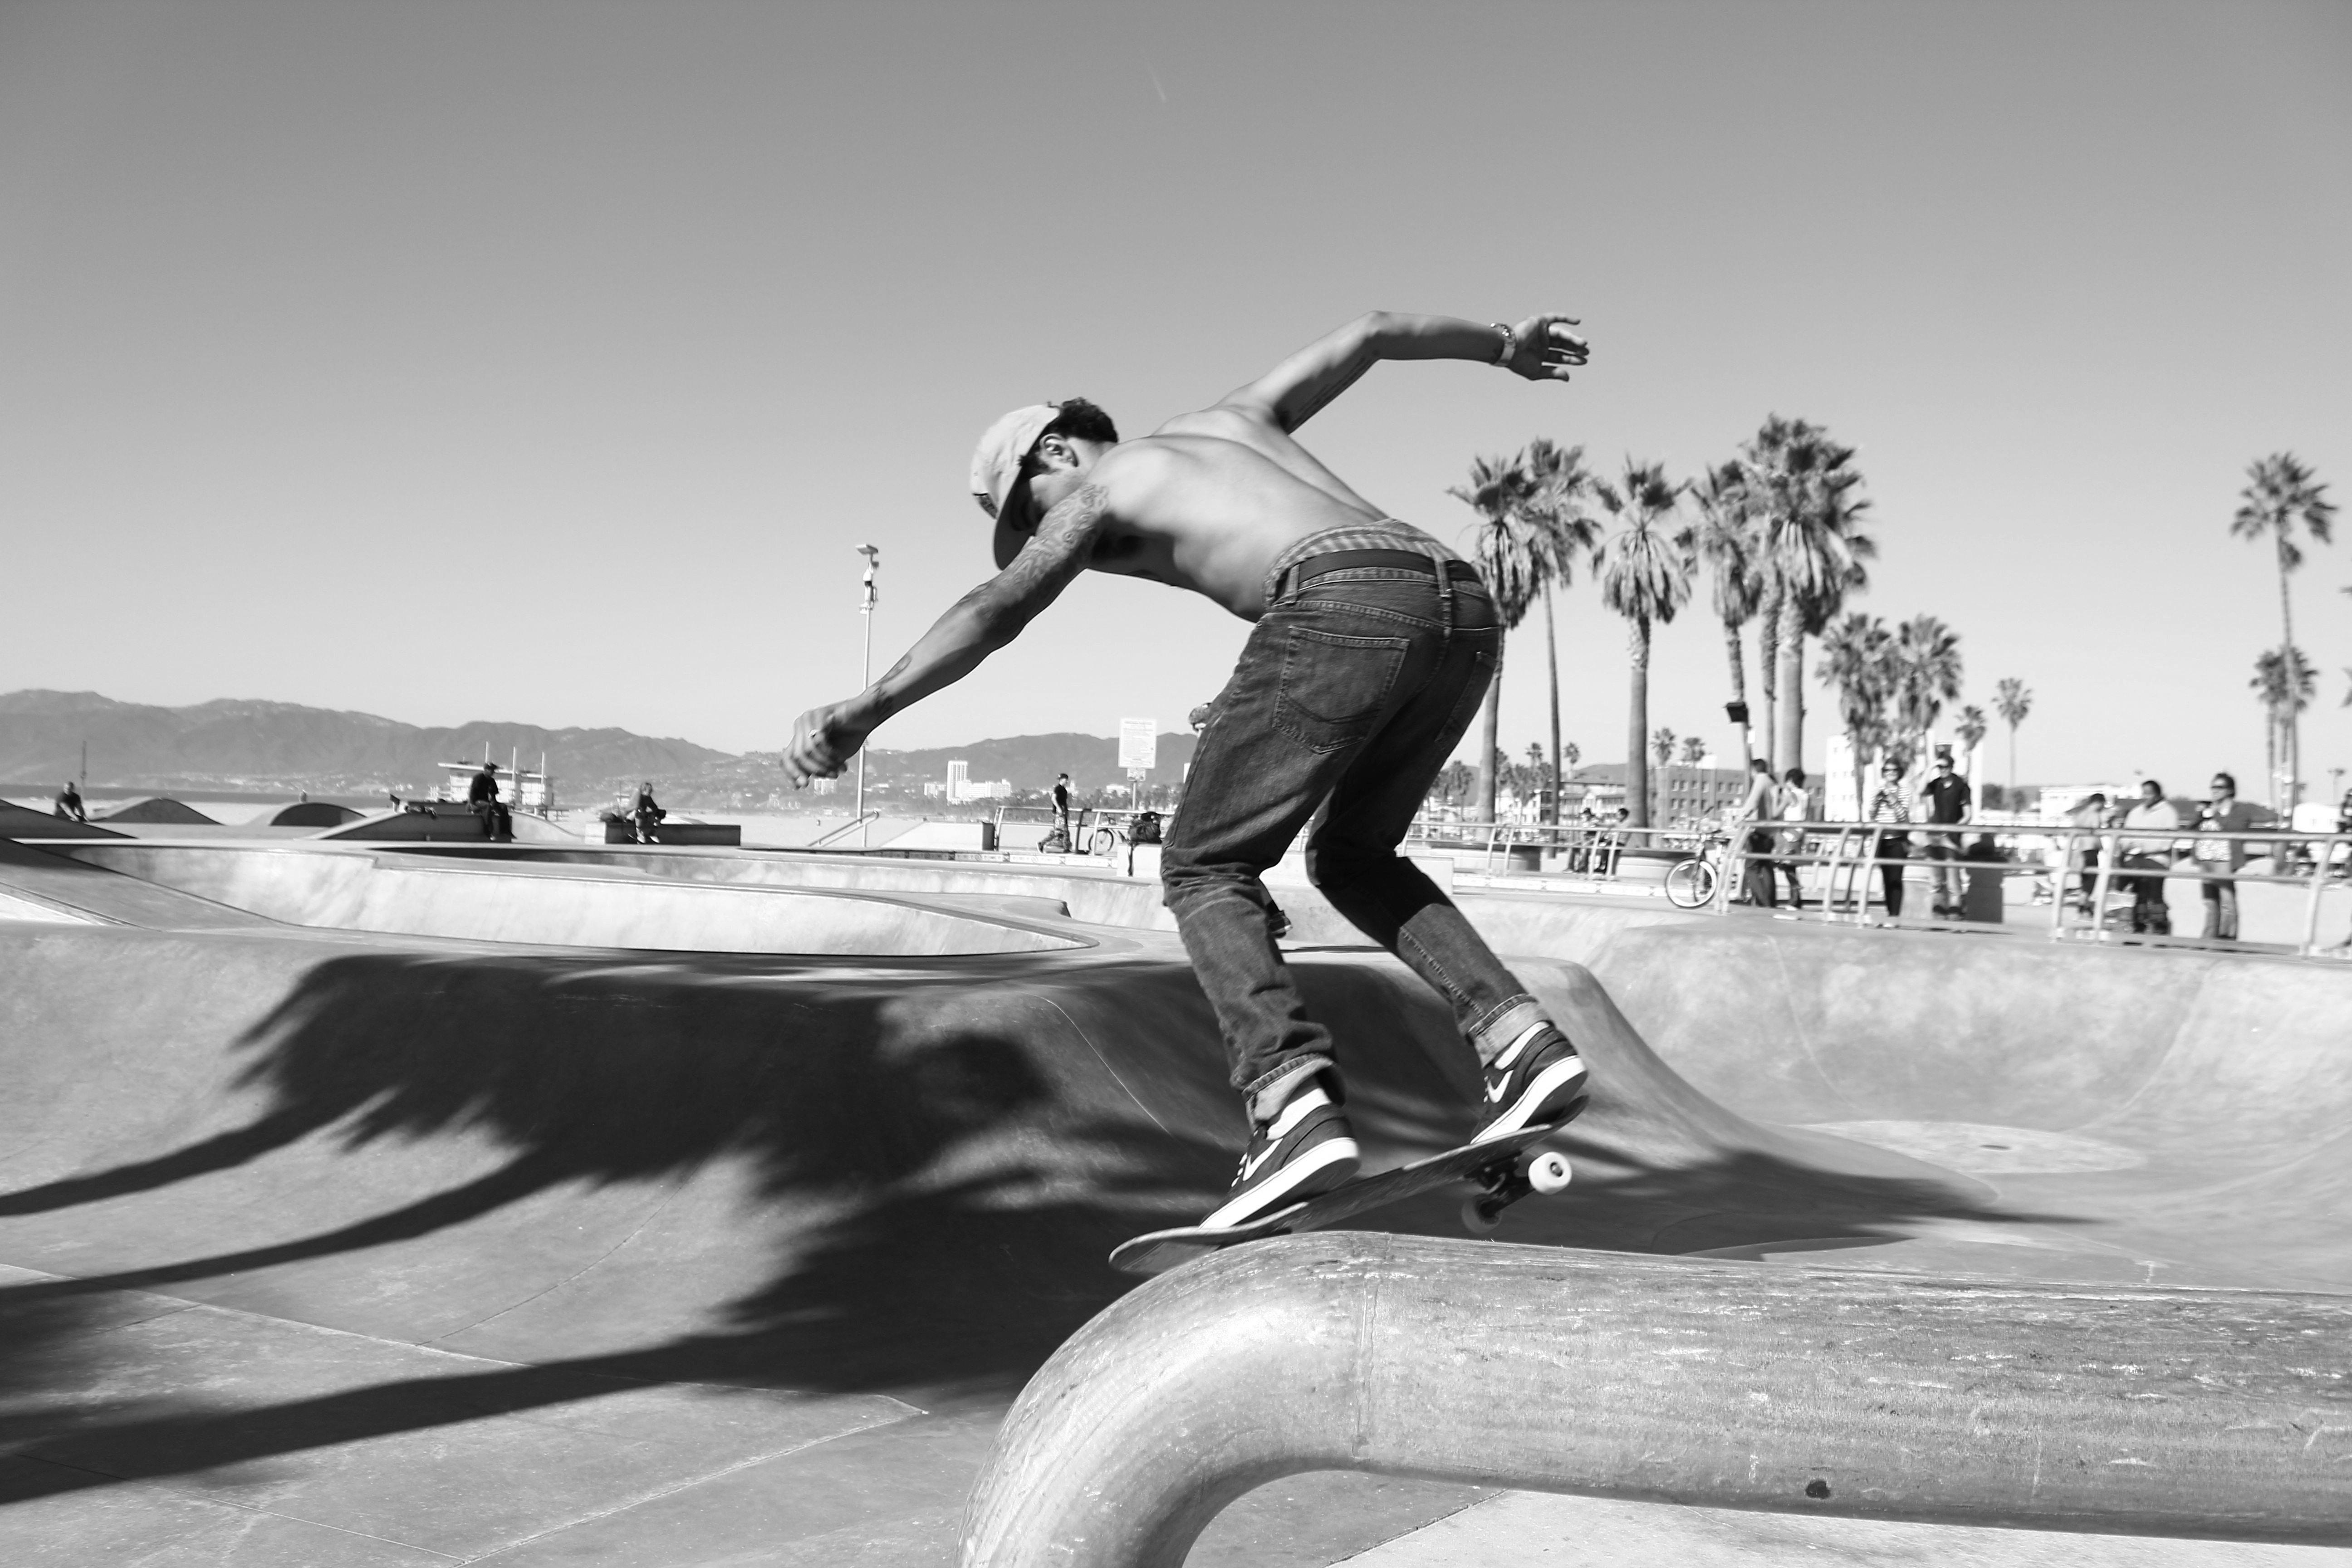 A shirtless man skateboarding at the Venice Beach Skatepark